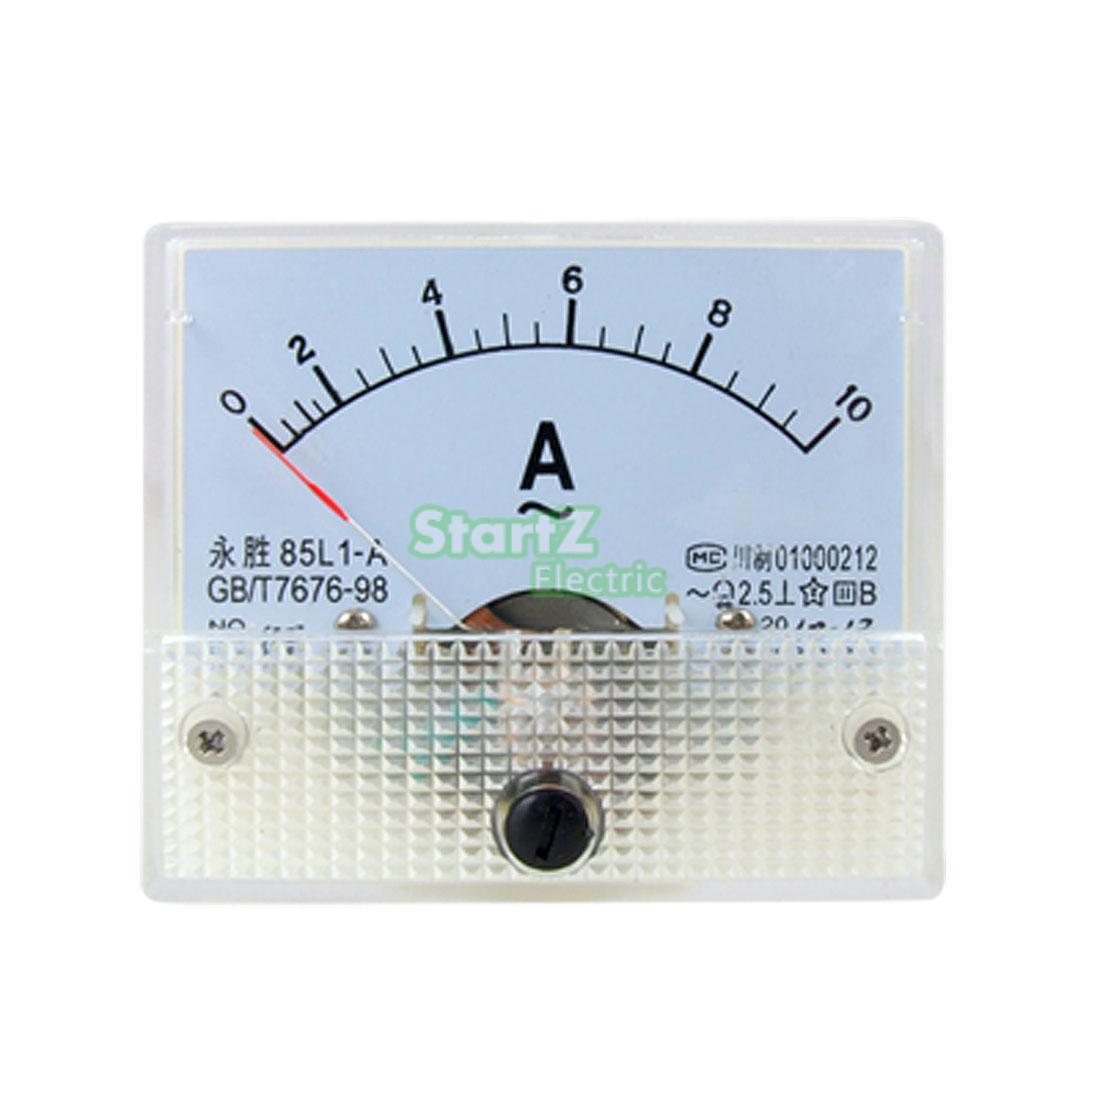 Analog Ac Amp Meter : Ac analog meter panel a amp current ammeters l